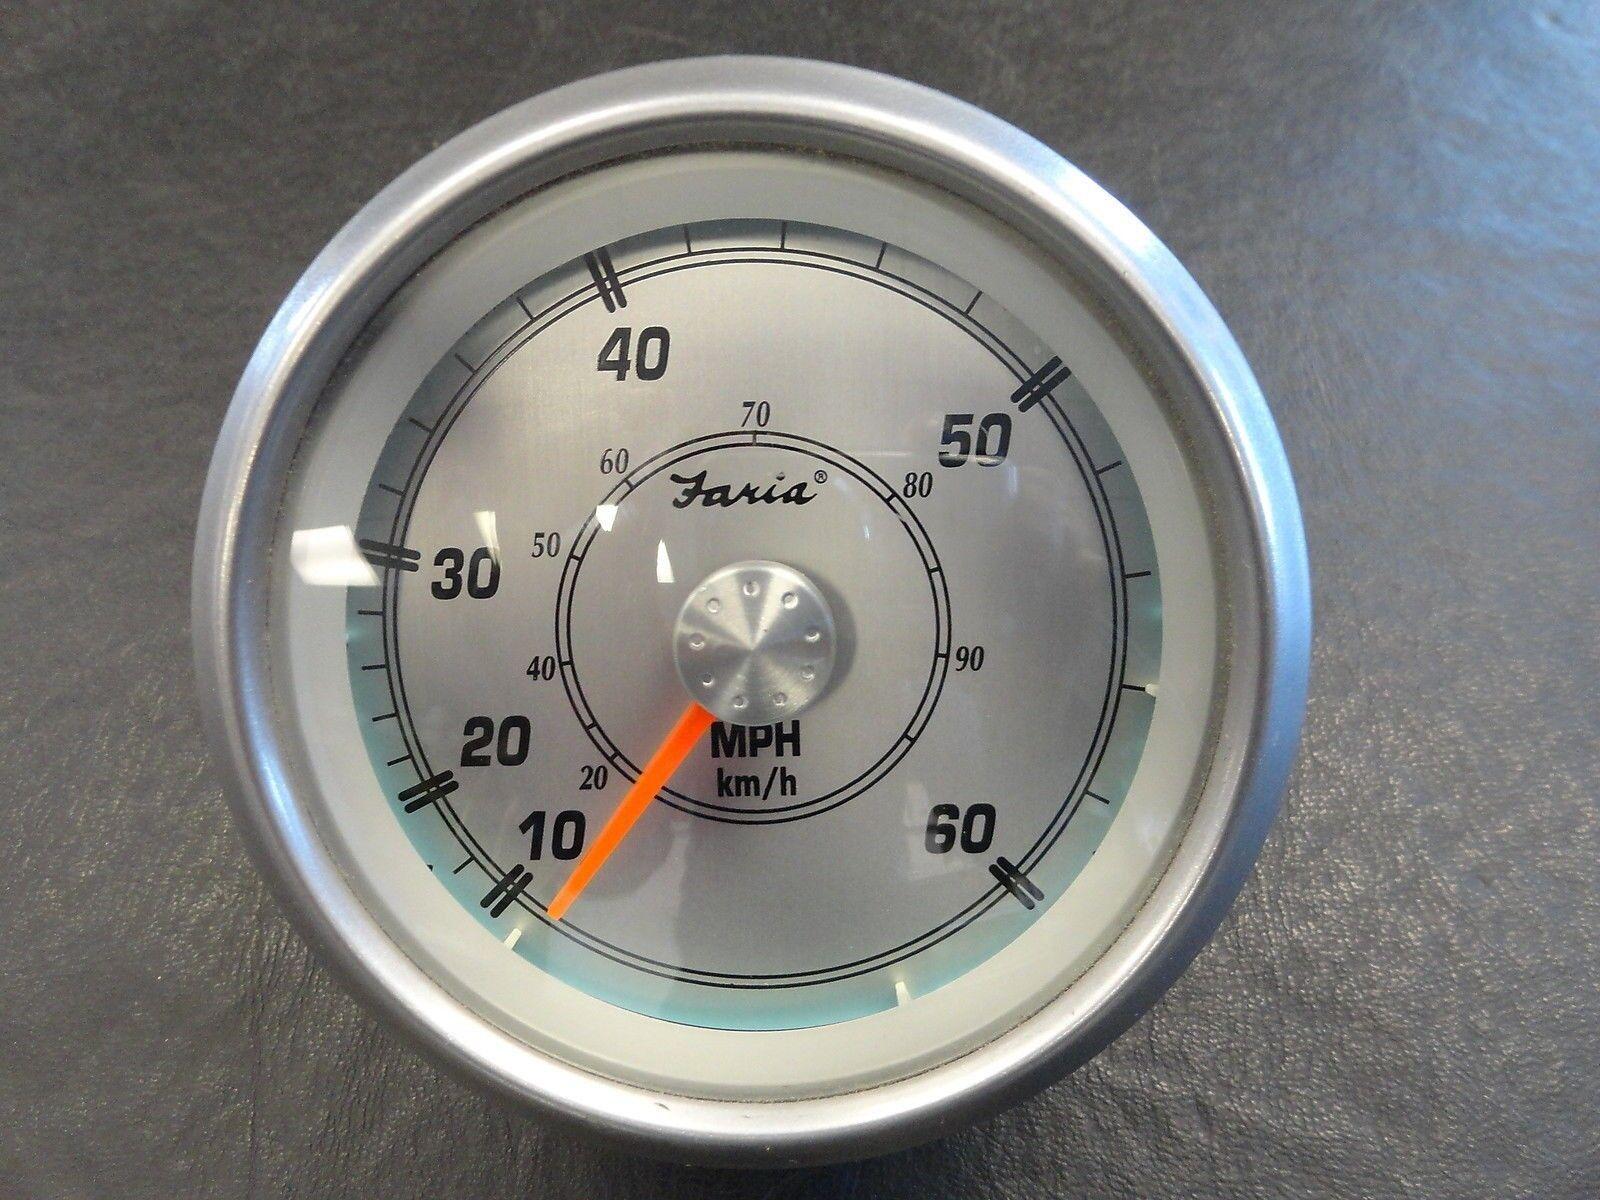 faria speedometer gauge silver bezel face 3 1 4 marine. Black Bedroom Furniture Sets. Home Design Ideas